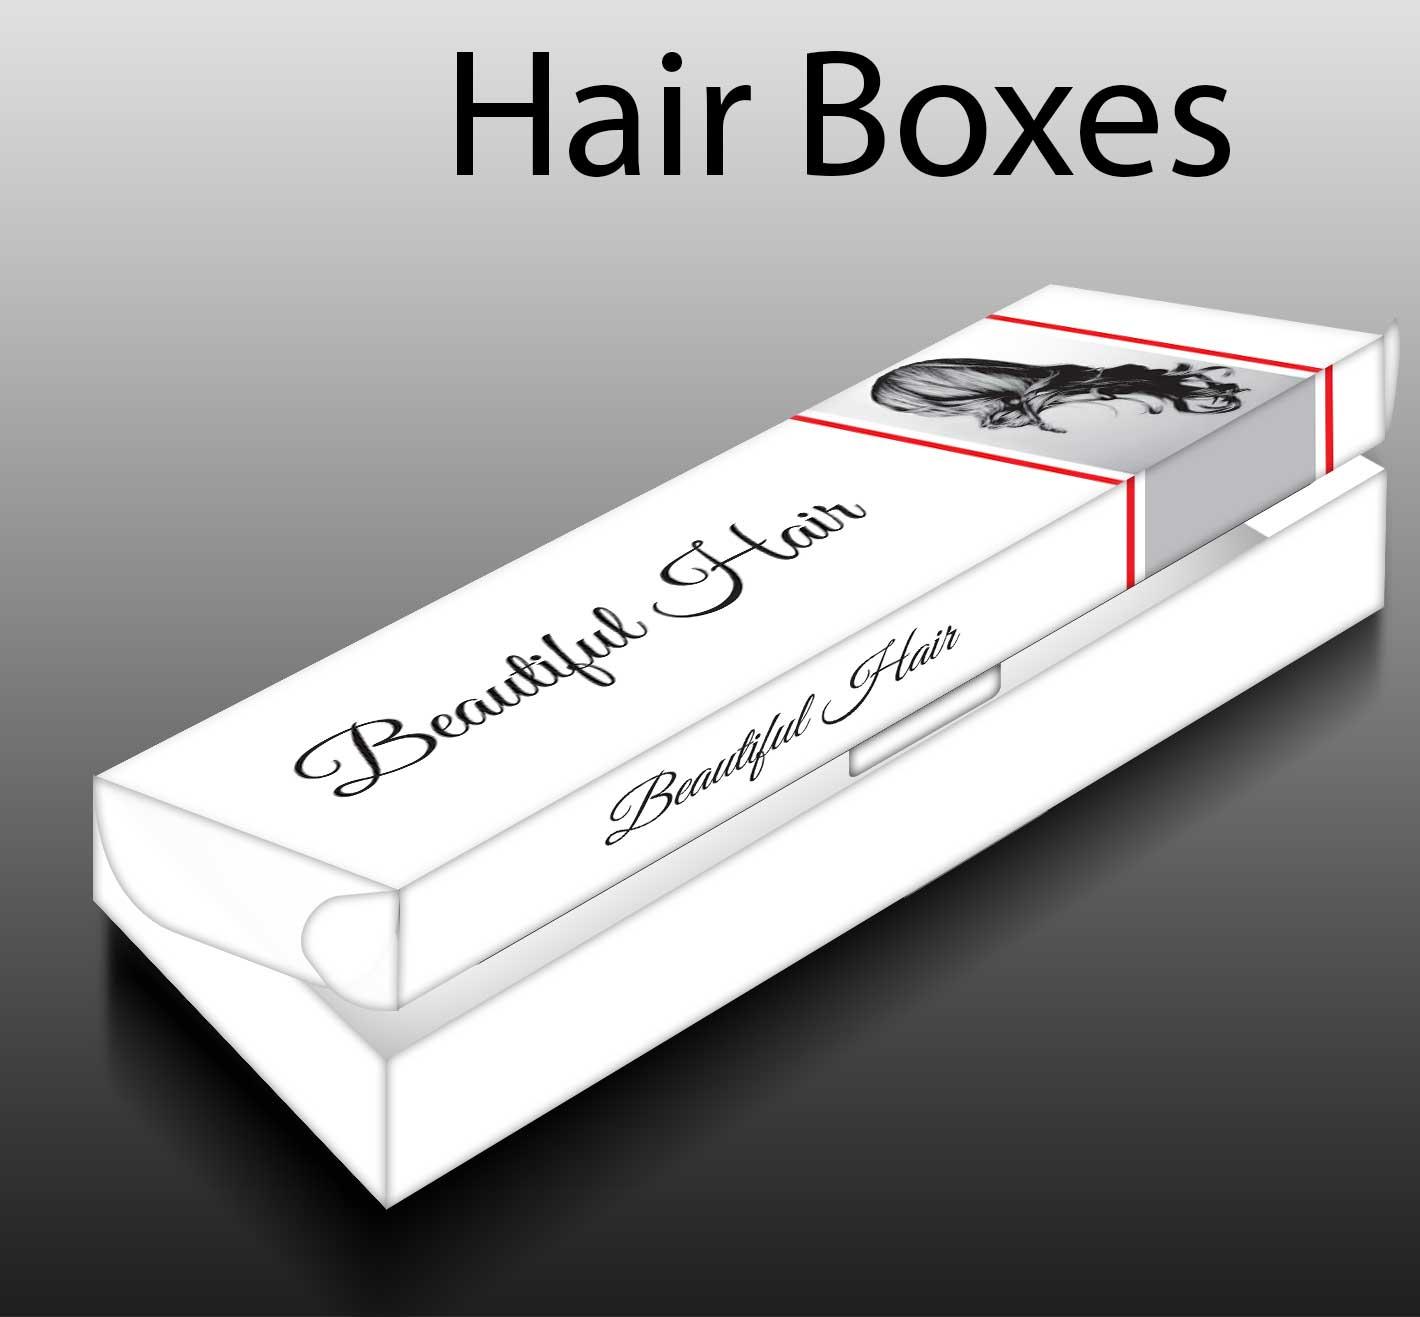 Hair Boxes